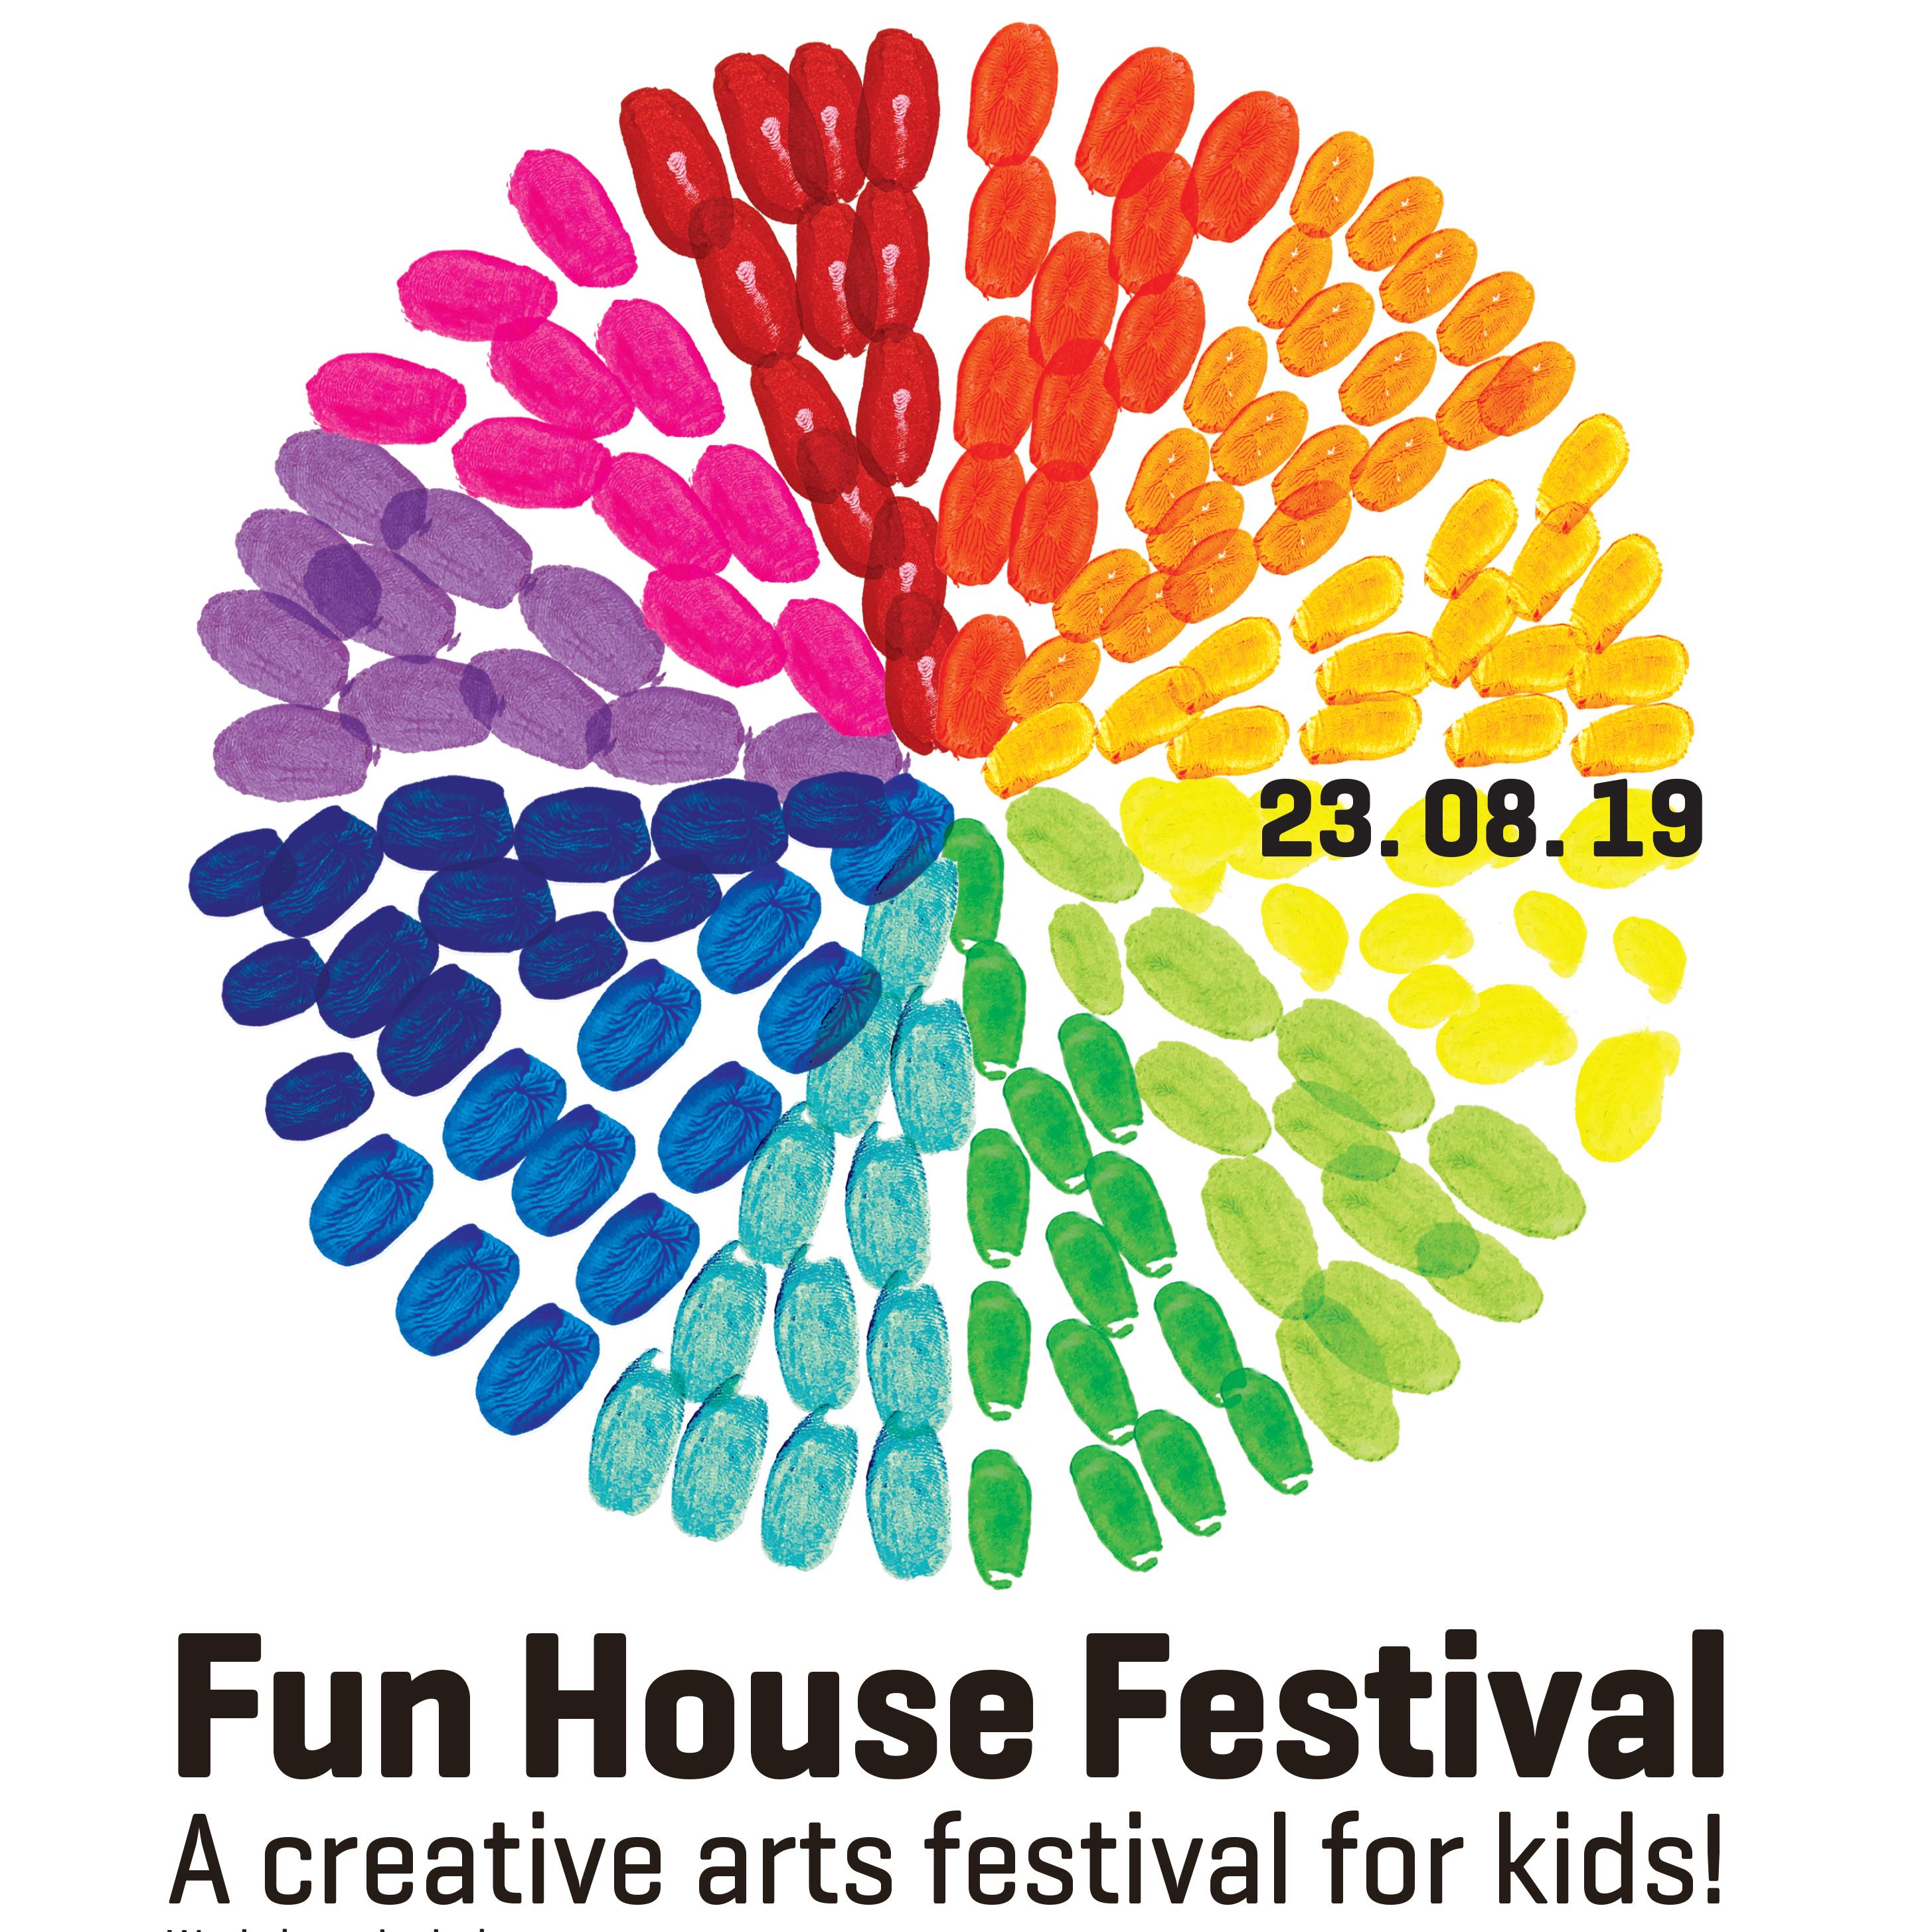 Fun House Festival Poster 2019